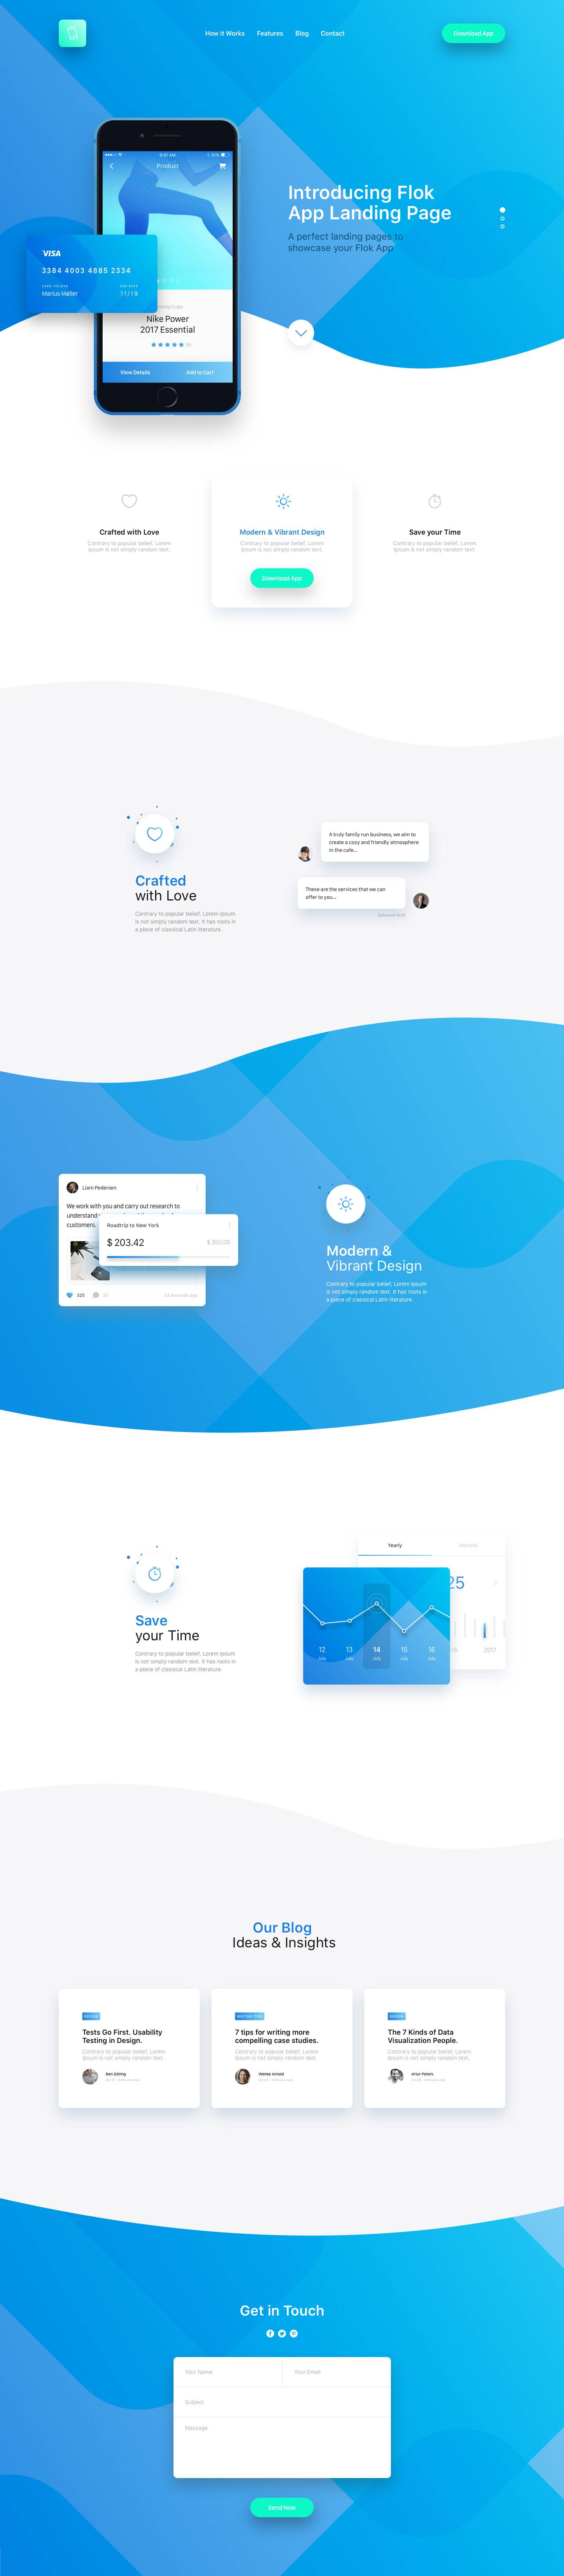 app 网站着陆页UI界面模板psd&sketch素材下载 网页模板-第1张